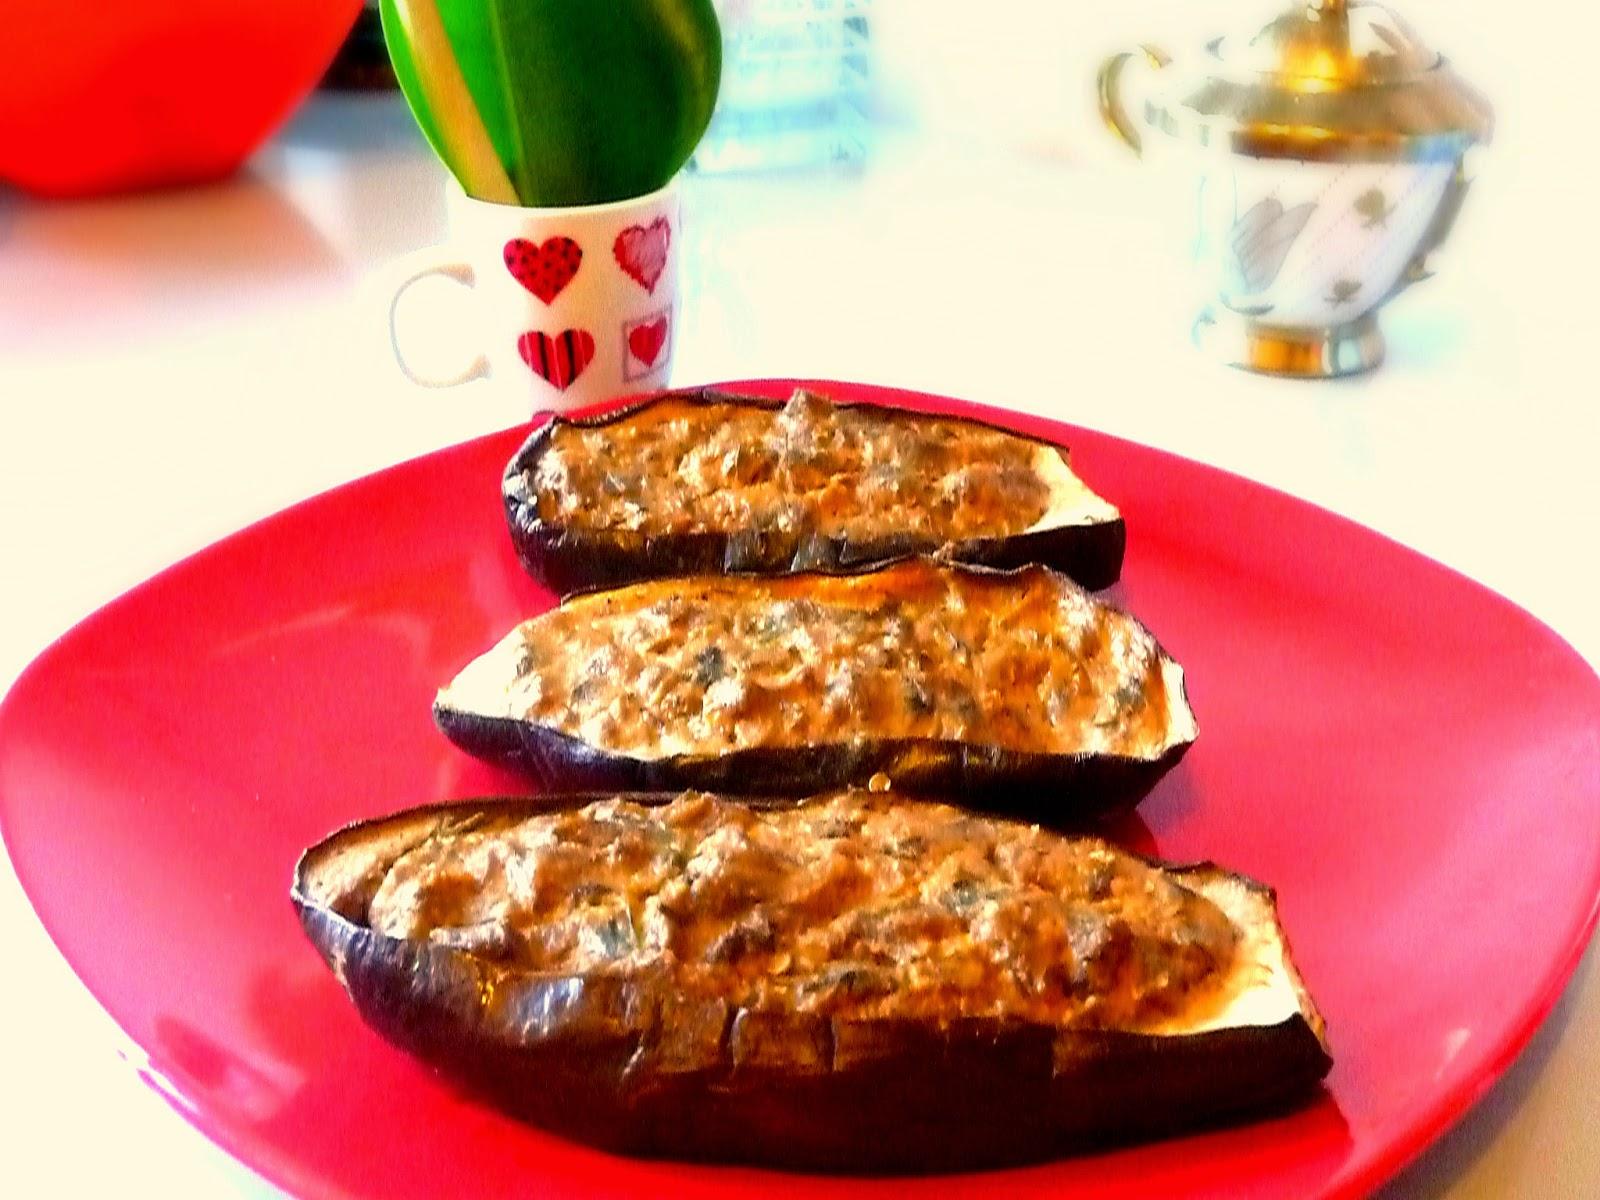 http://theseamanmom.com/quick-stuffed-eggplant/